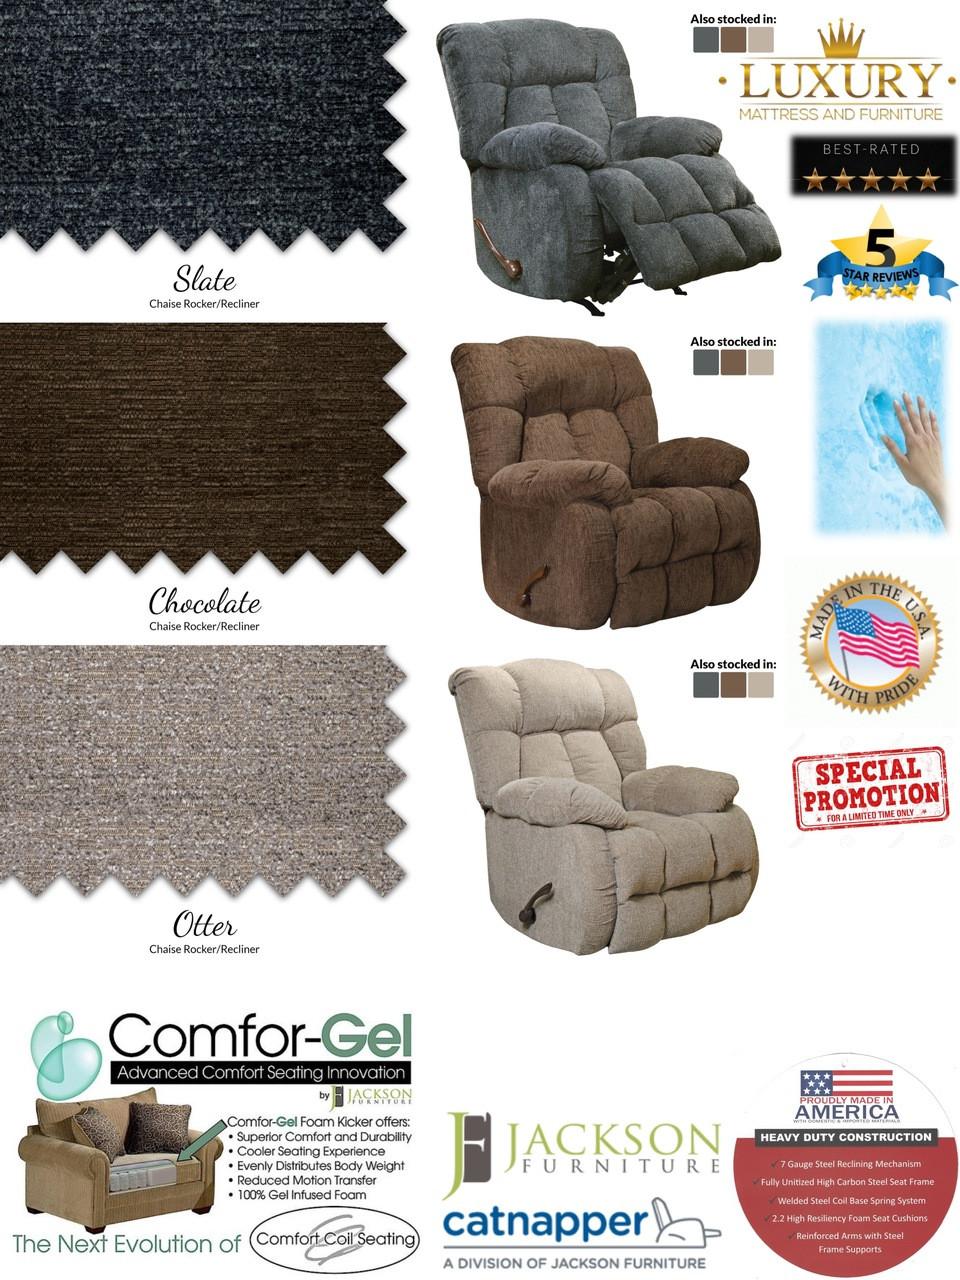 Surprising Catnapper Brody Comfort Gel Rocker Recliner Creativecarmelina Interior Chair Design Creativecarmelinacom